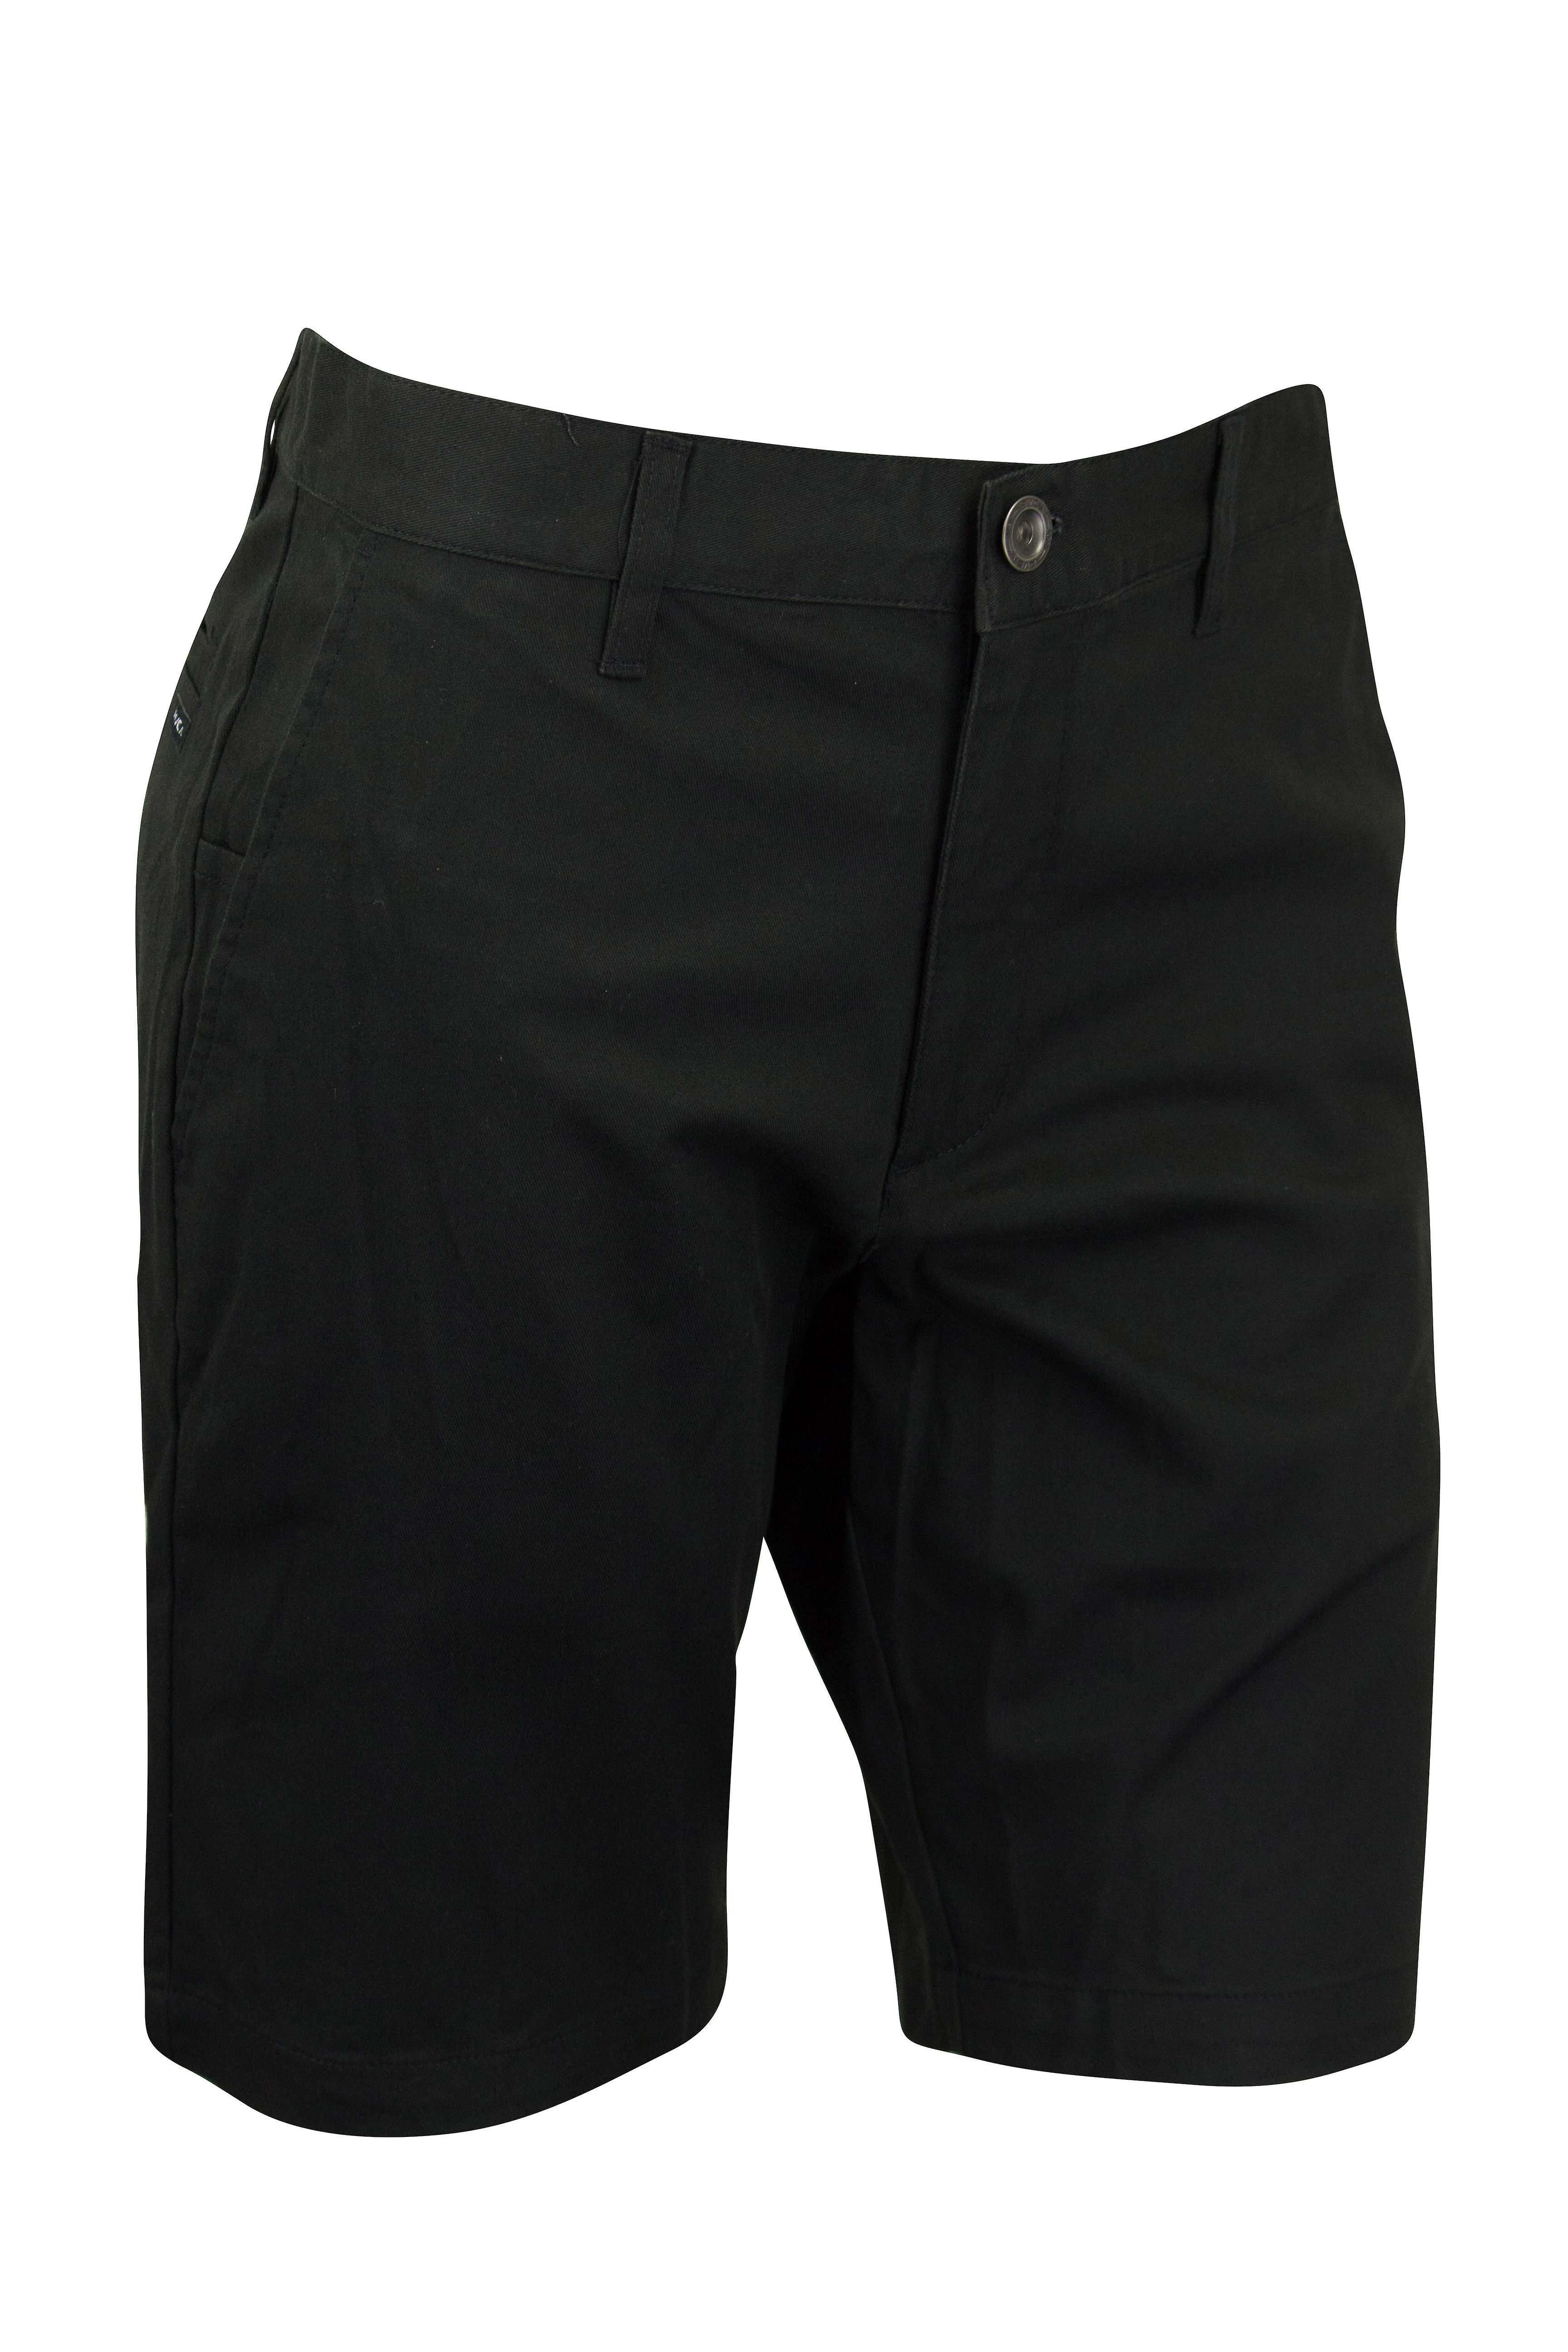 RVCA Mens VA Sport Weekend Stretch Casual Chino Shorts - Black